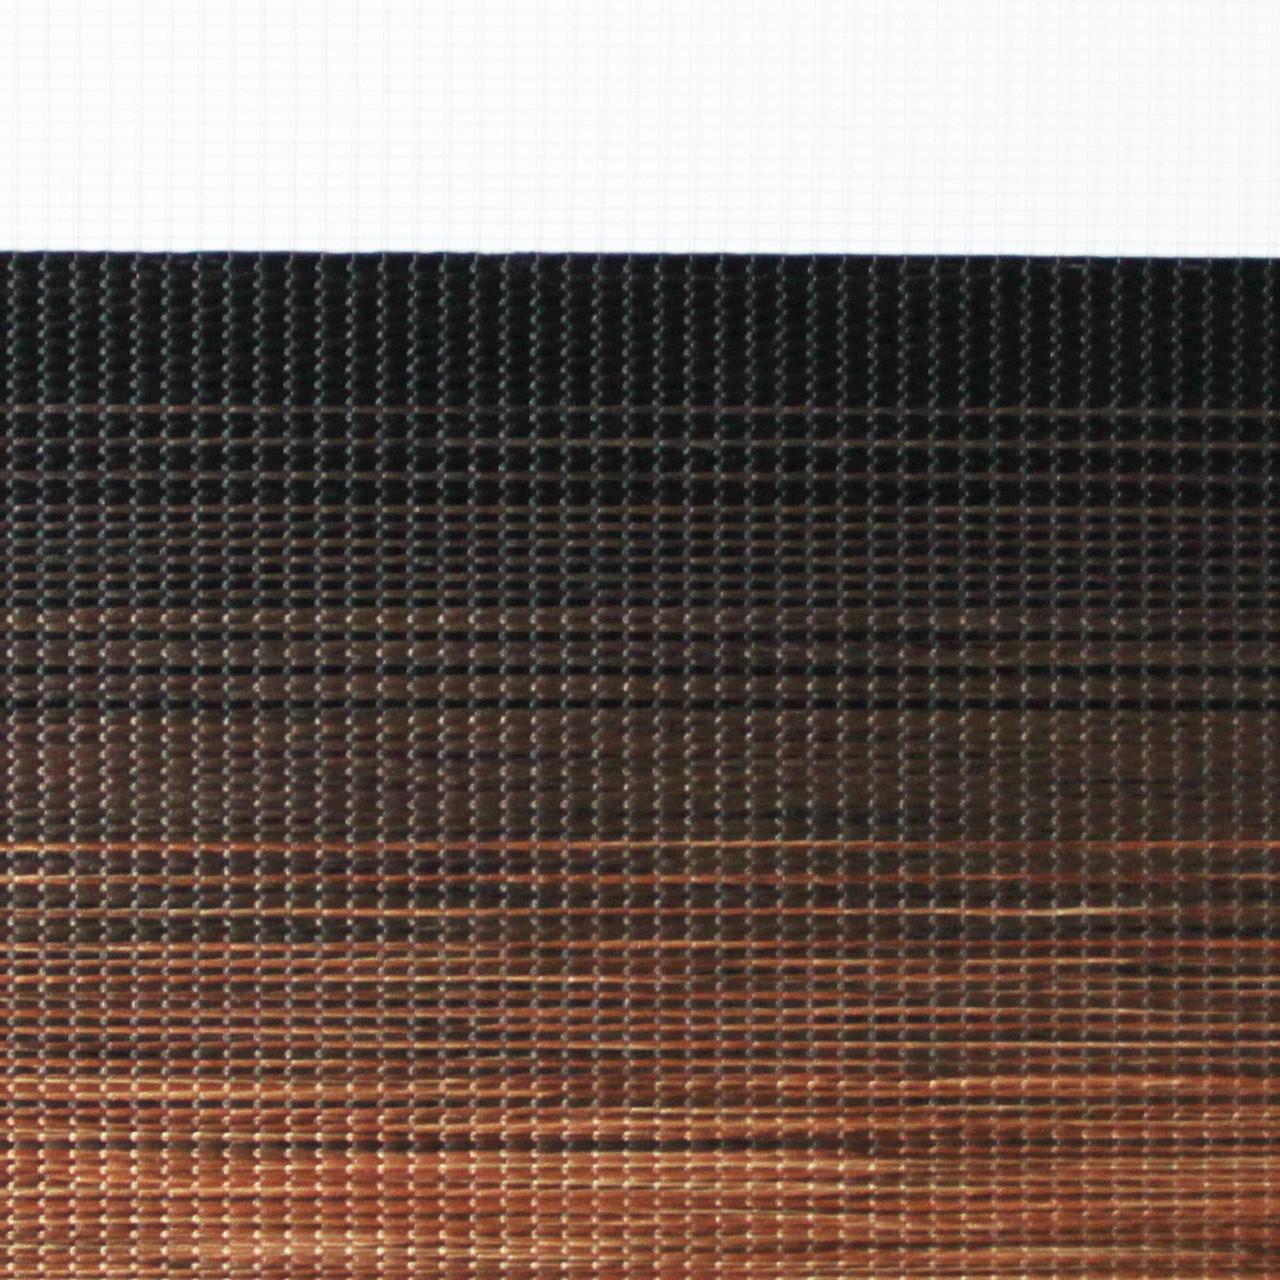 Рулонные шторы День-ночь Ткань Багамы Шоколад